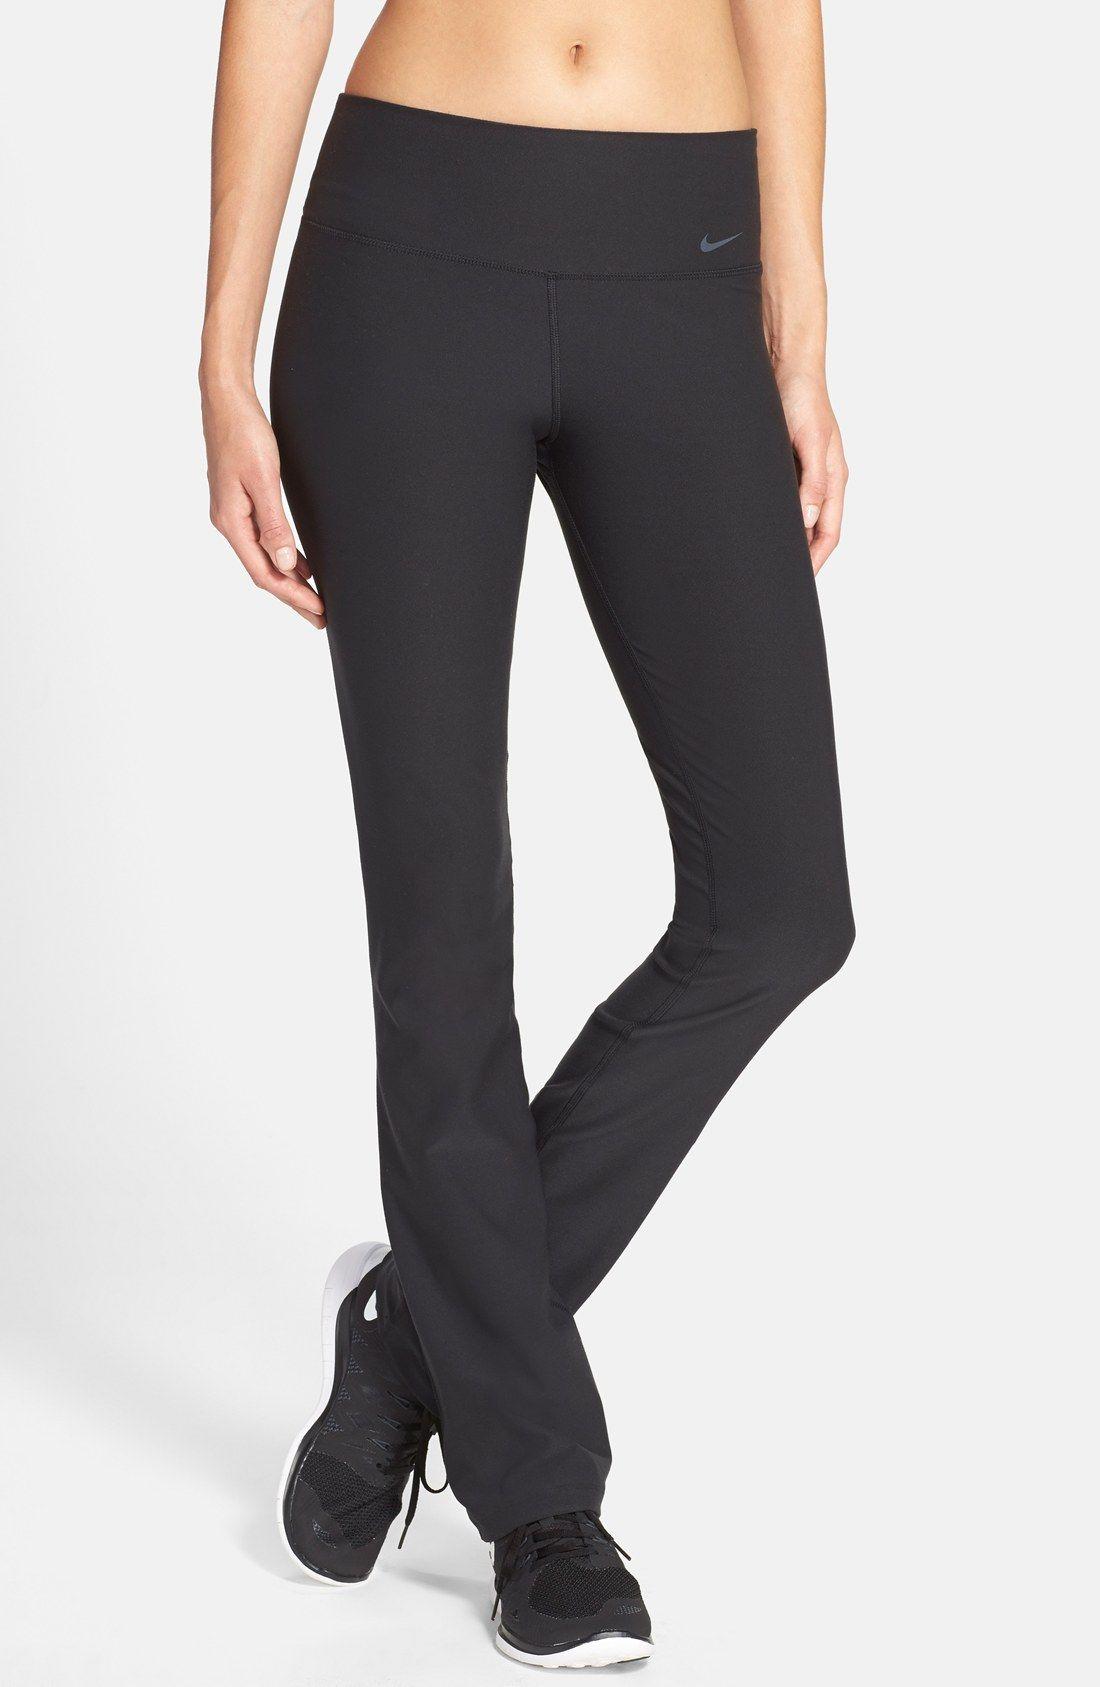 8f02529d924d Nike  Legend  Slim Fit Training Pants -  70.00